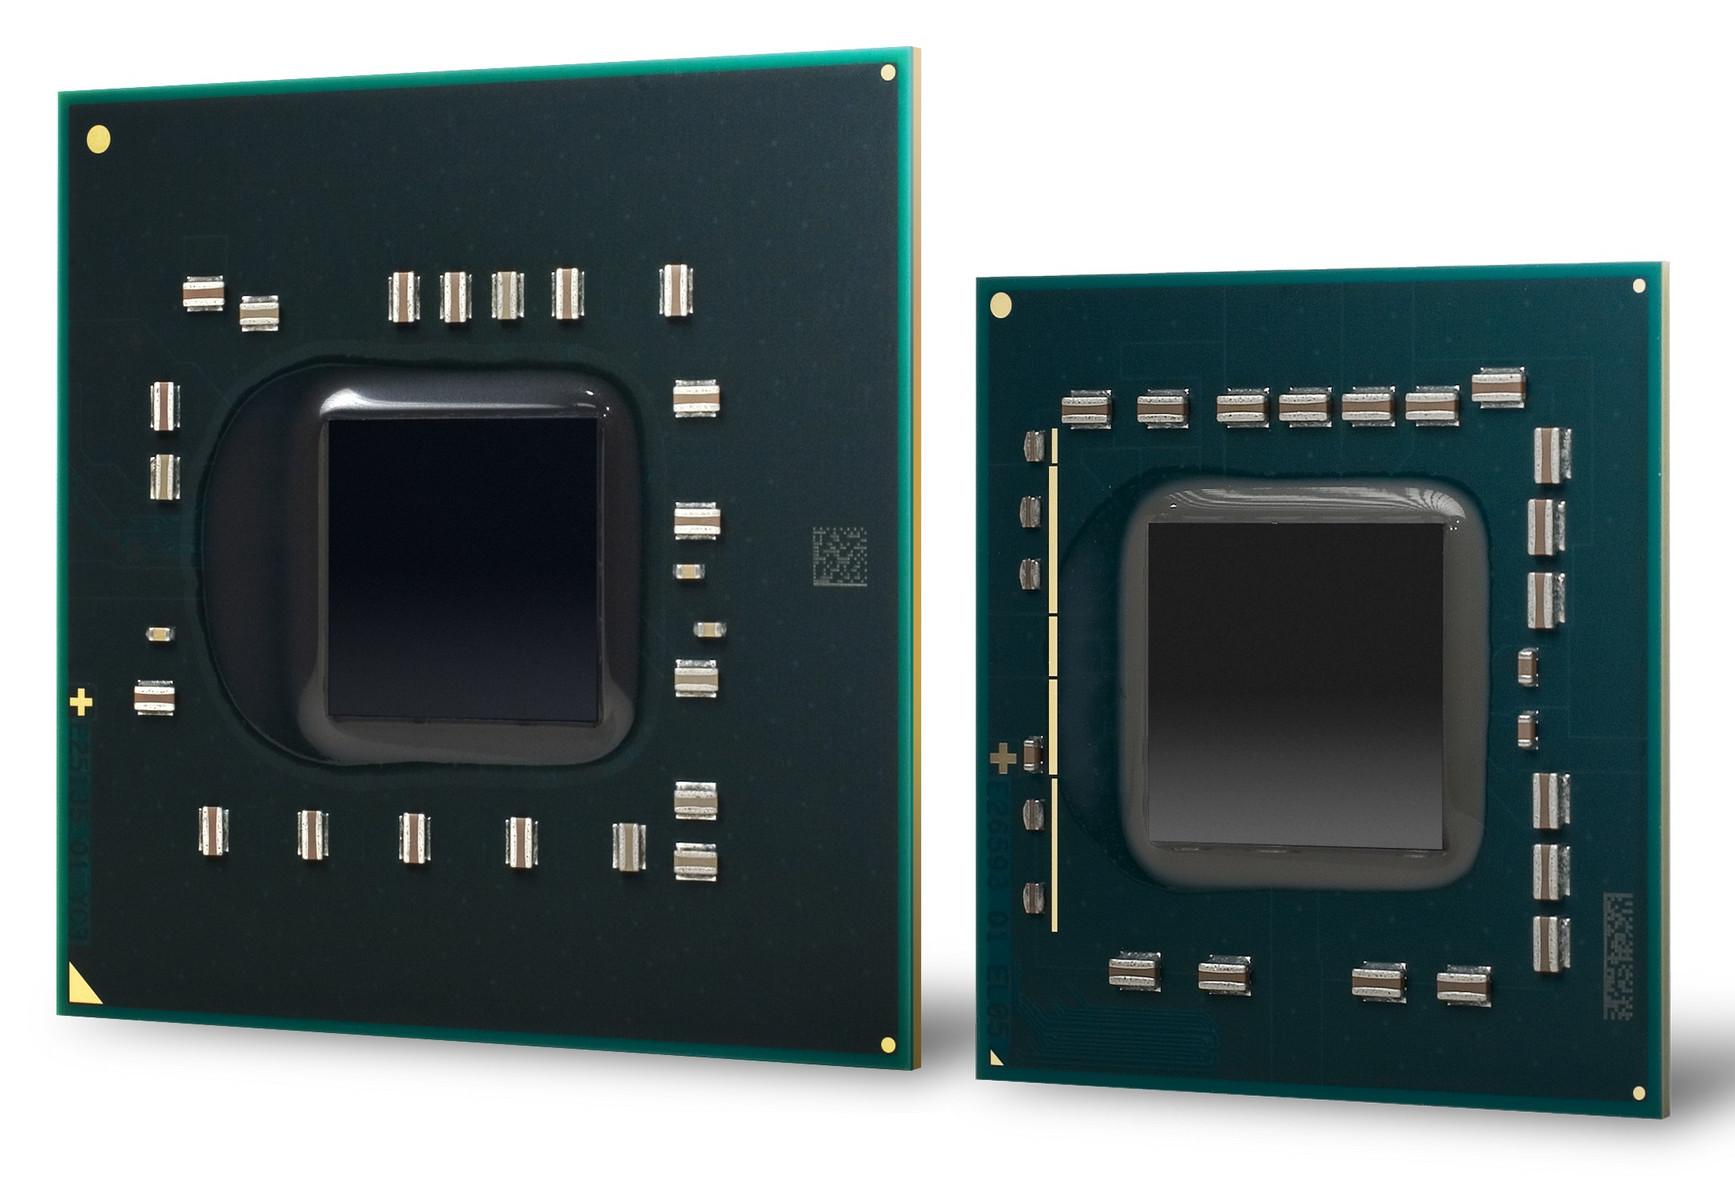 Dell Inspiron 535 NVIDIA Geforce GT220 Graphics Treiber Windows 7